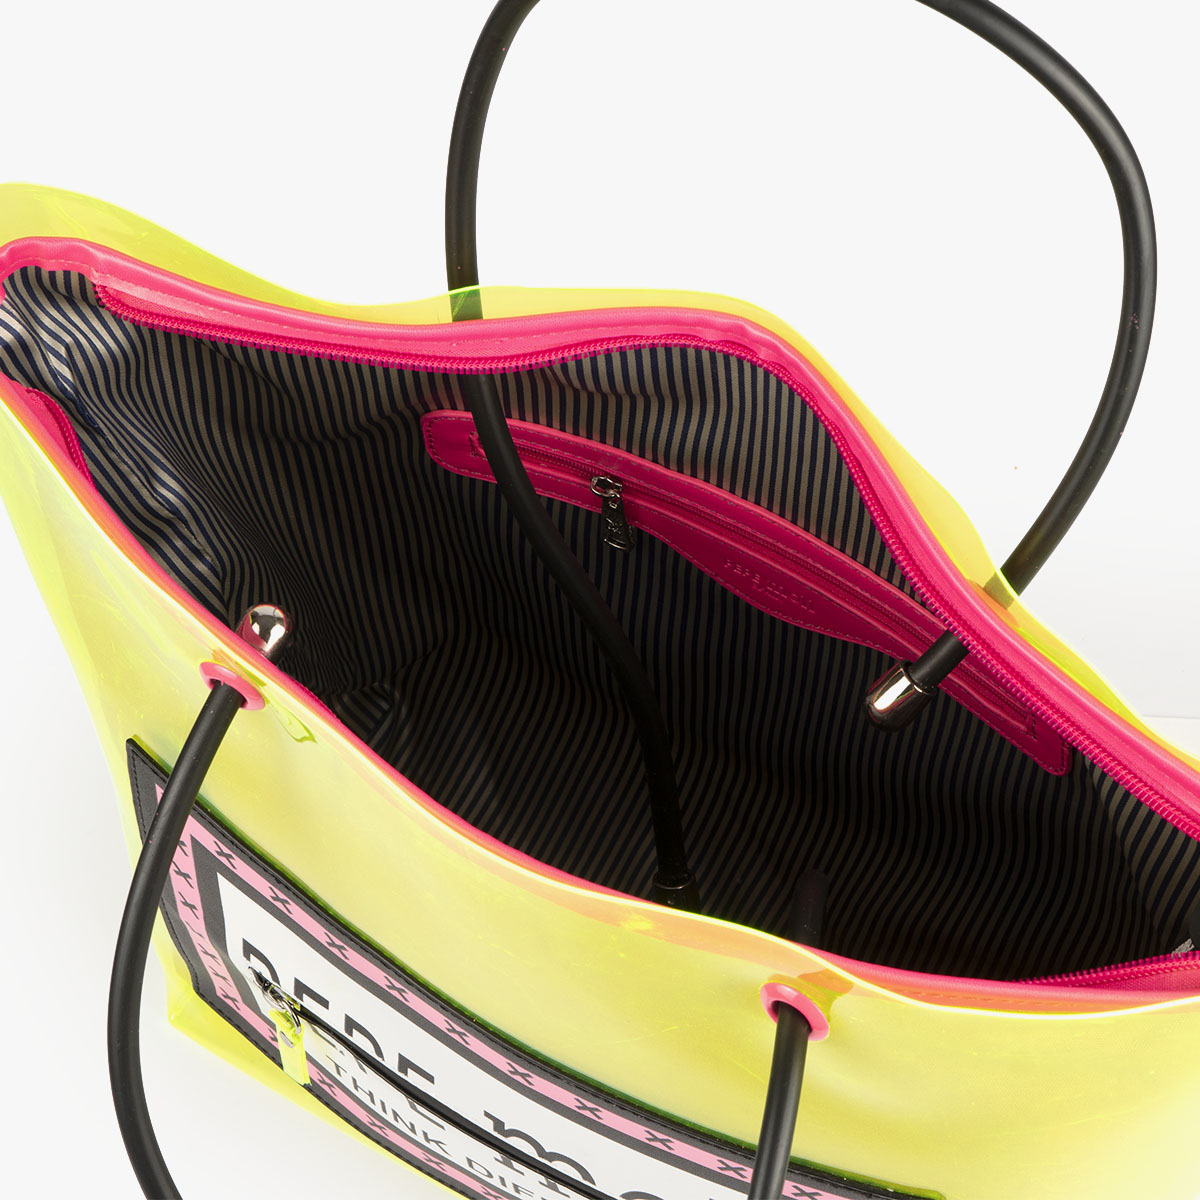 bolso de hombro con vinilo amarillo pepemoll 26125